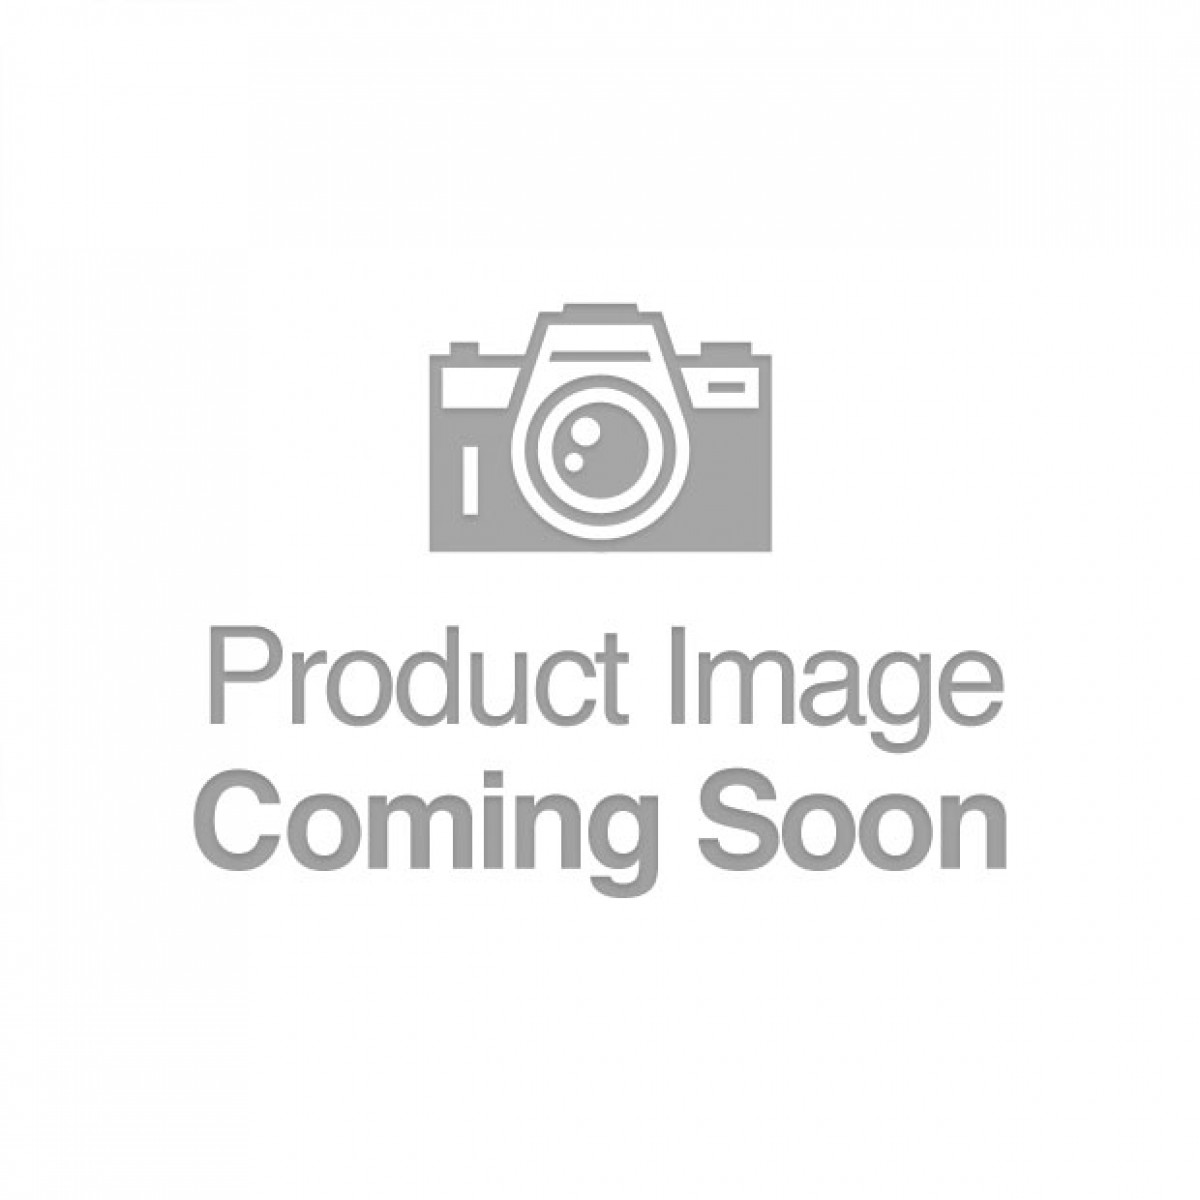 Fun Factory Hybrid Kit w/Rechargeable Batteries